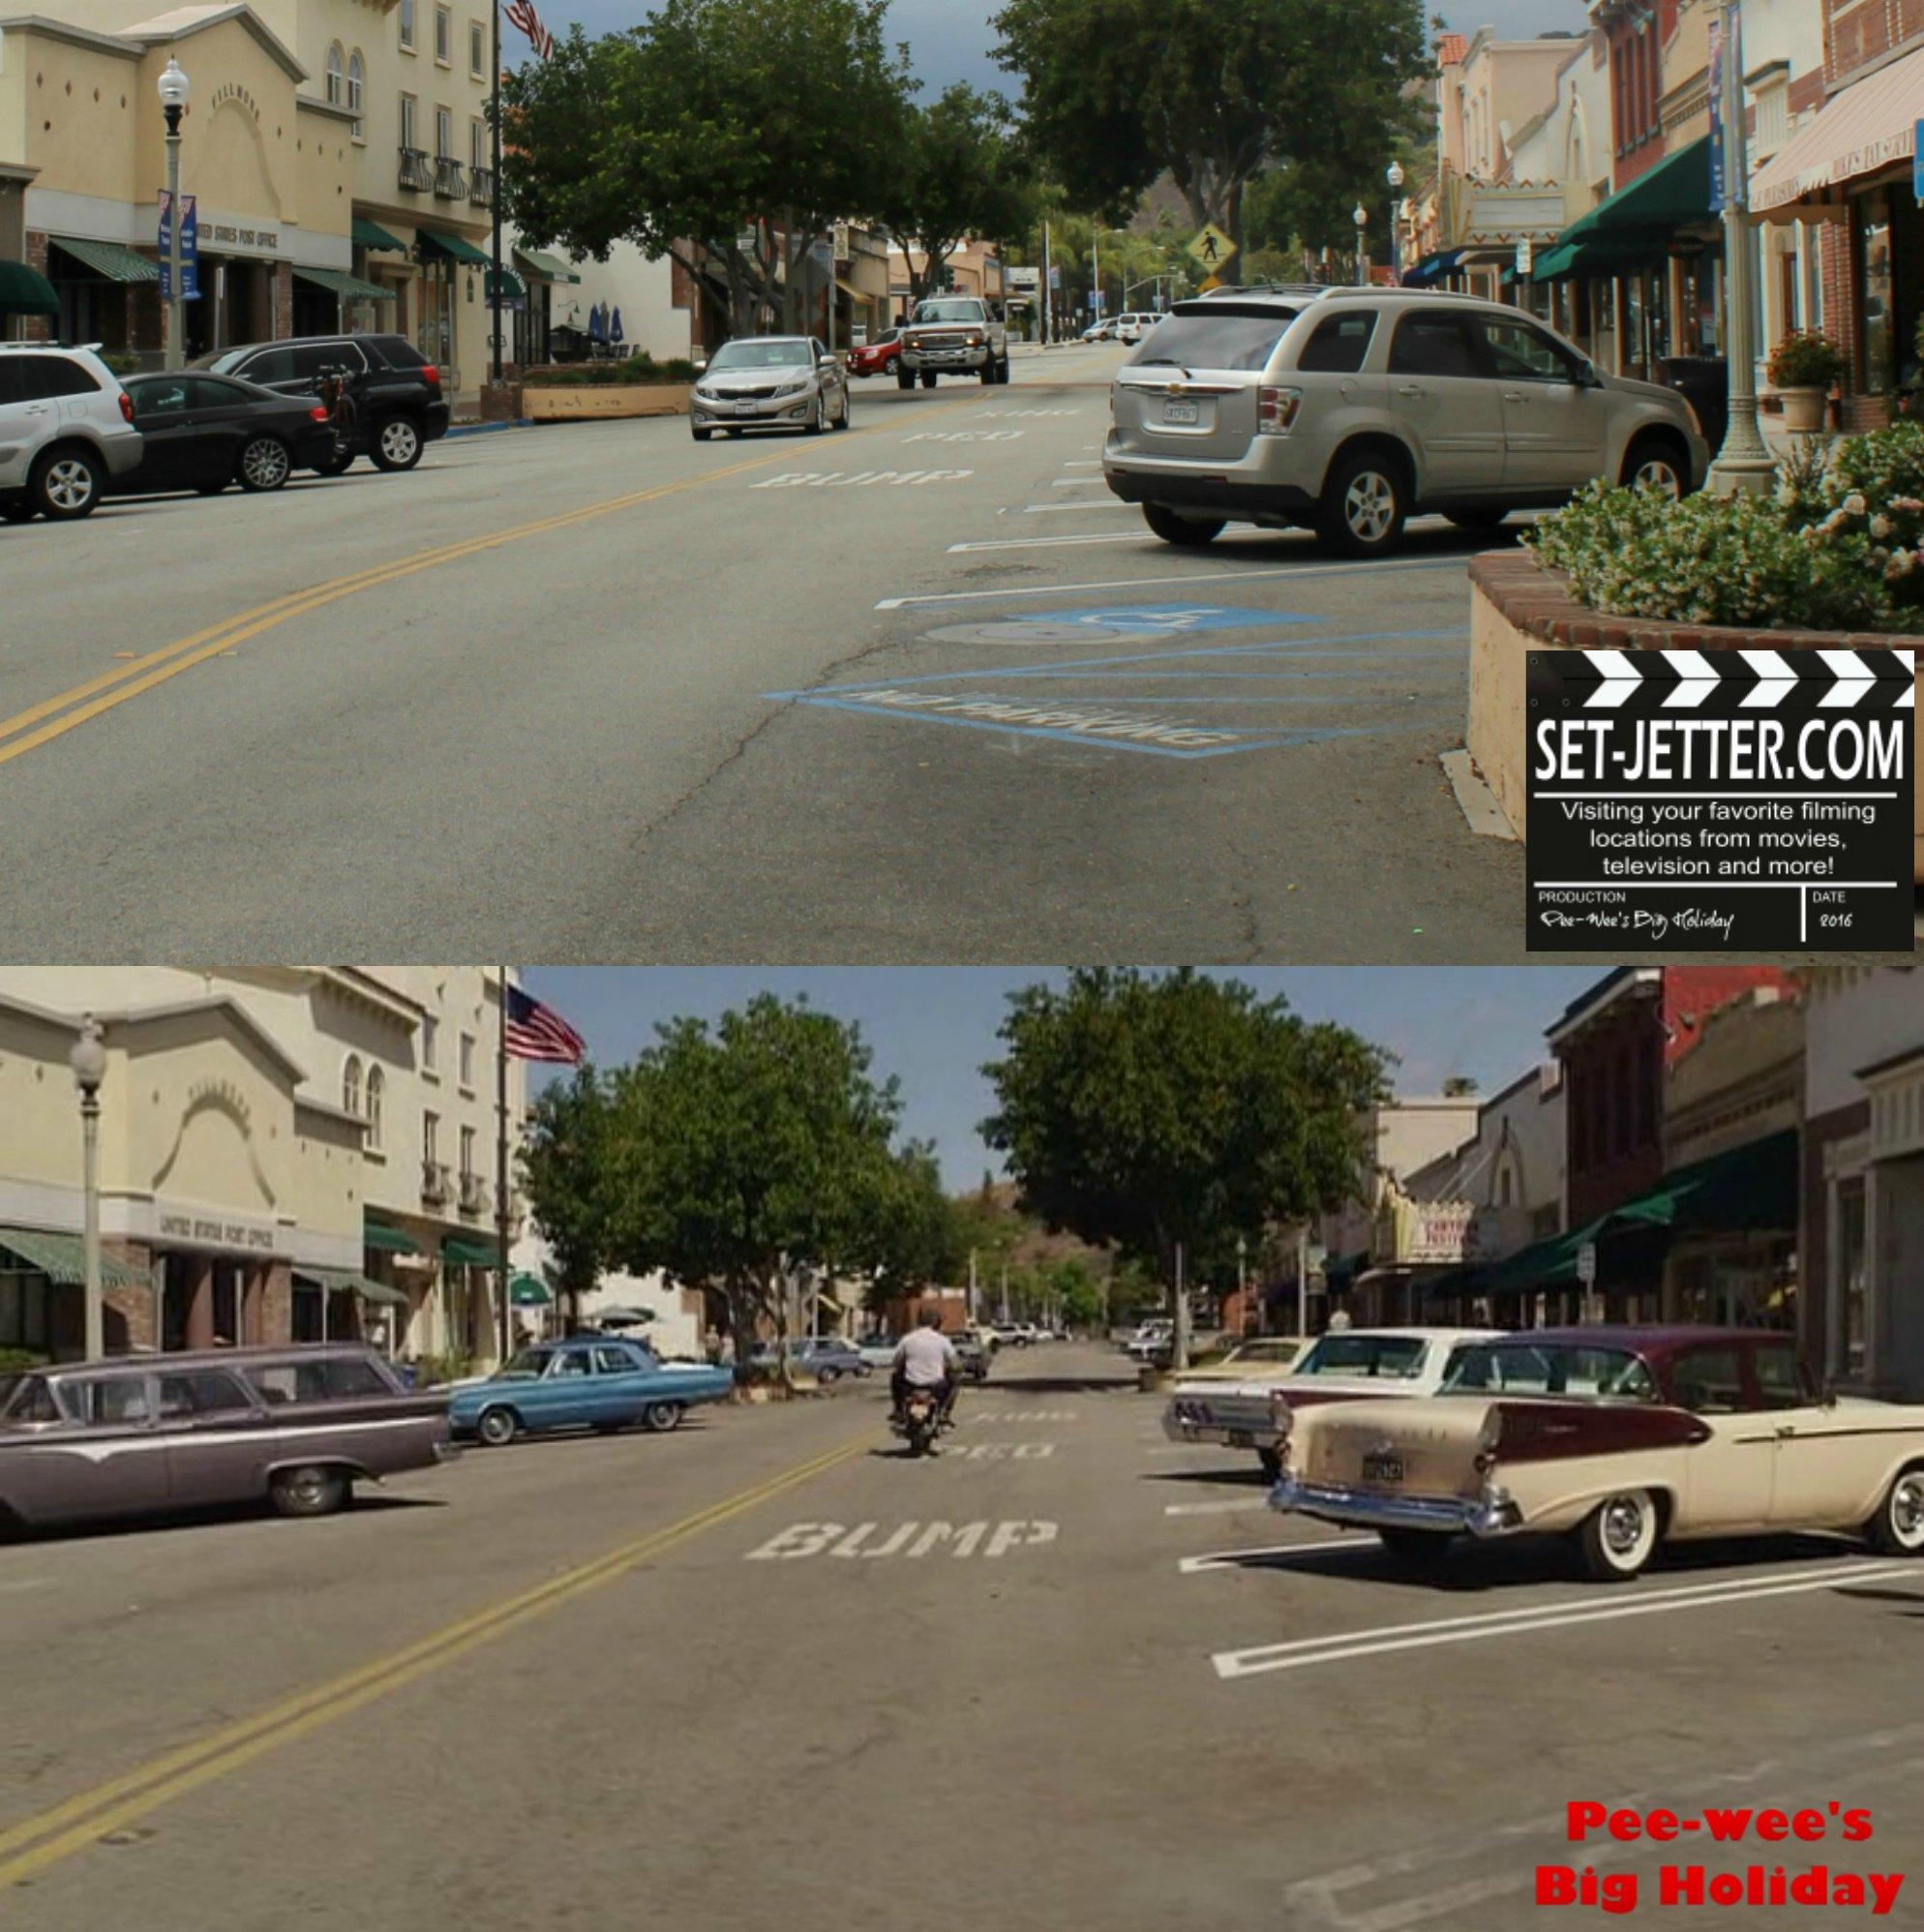 Pee Wee's Big Holiday comparison 371.jpg